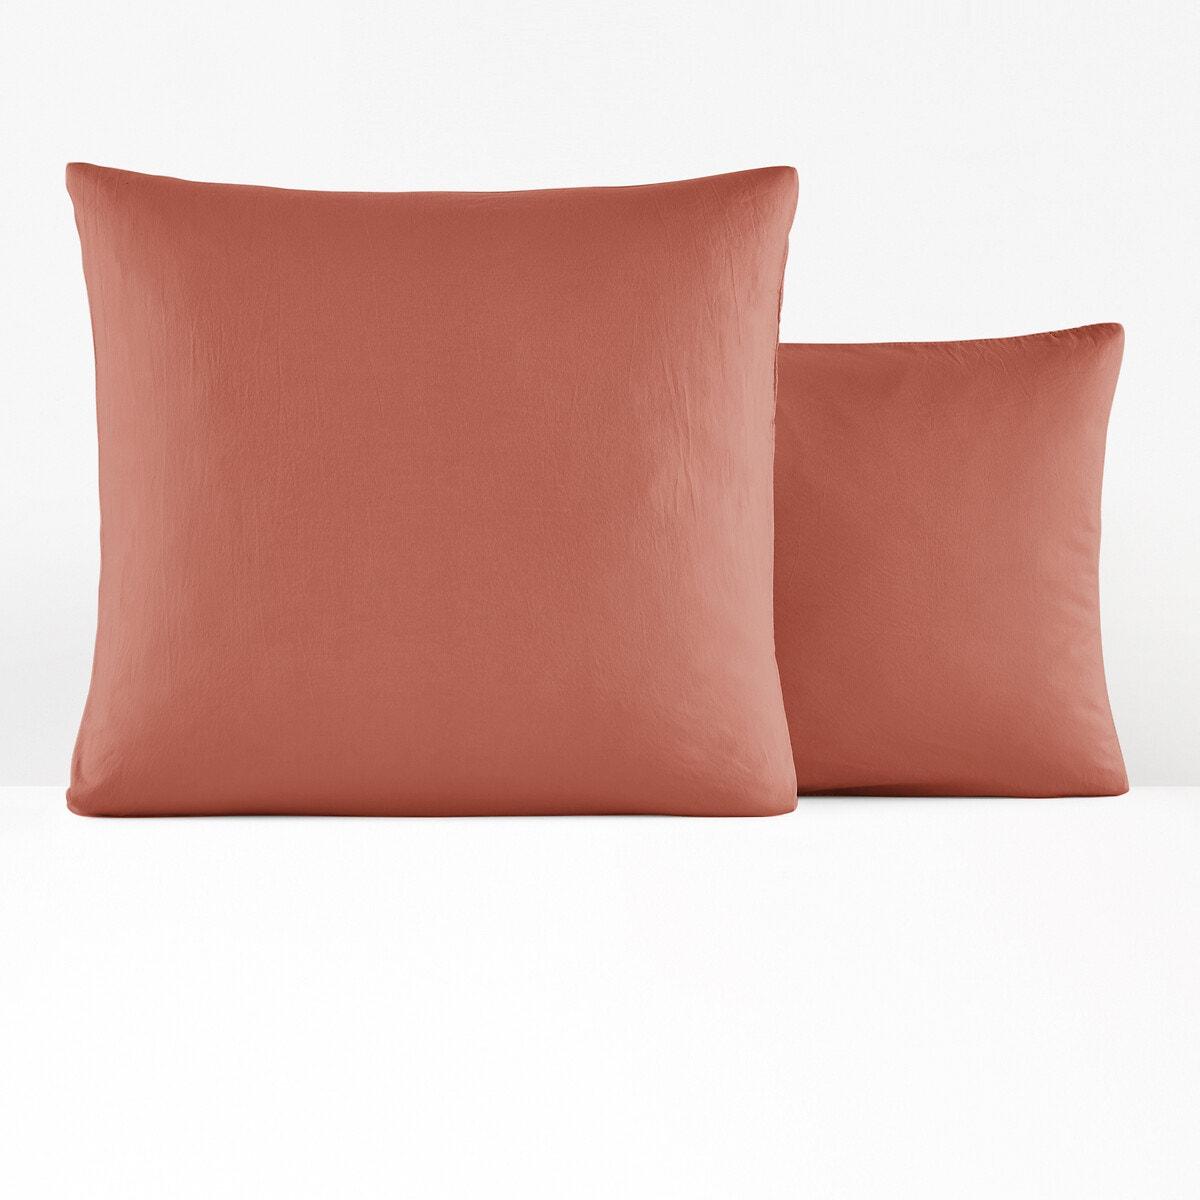 Elvira コットンボイル 枕カバー(フリルなし)